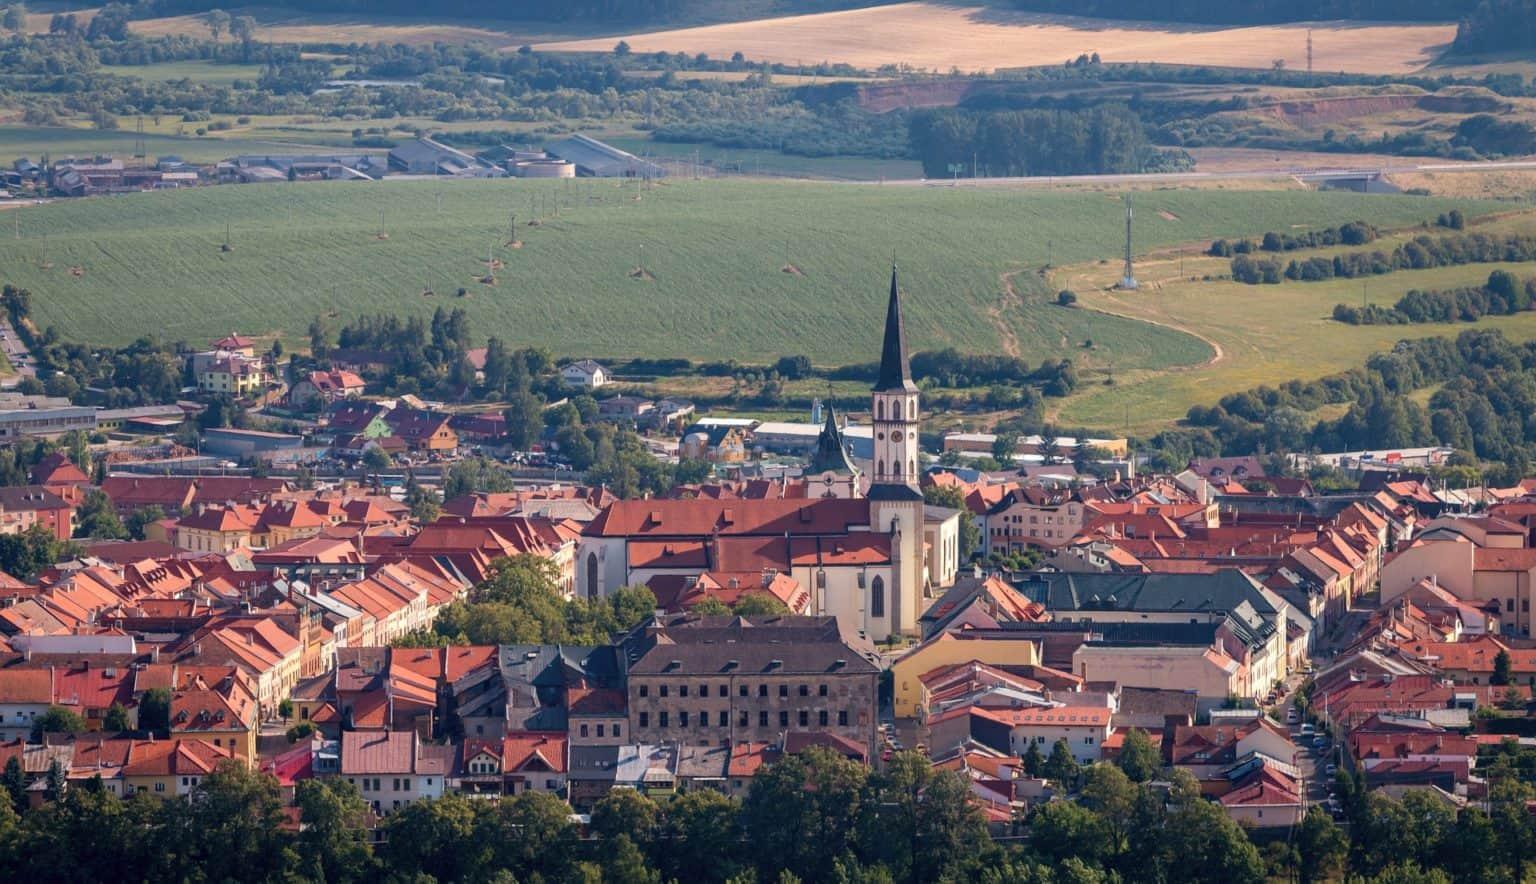 Walking tour in Levoča